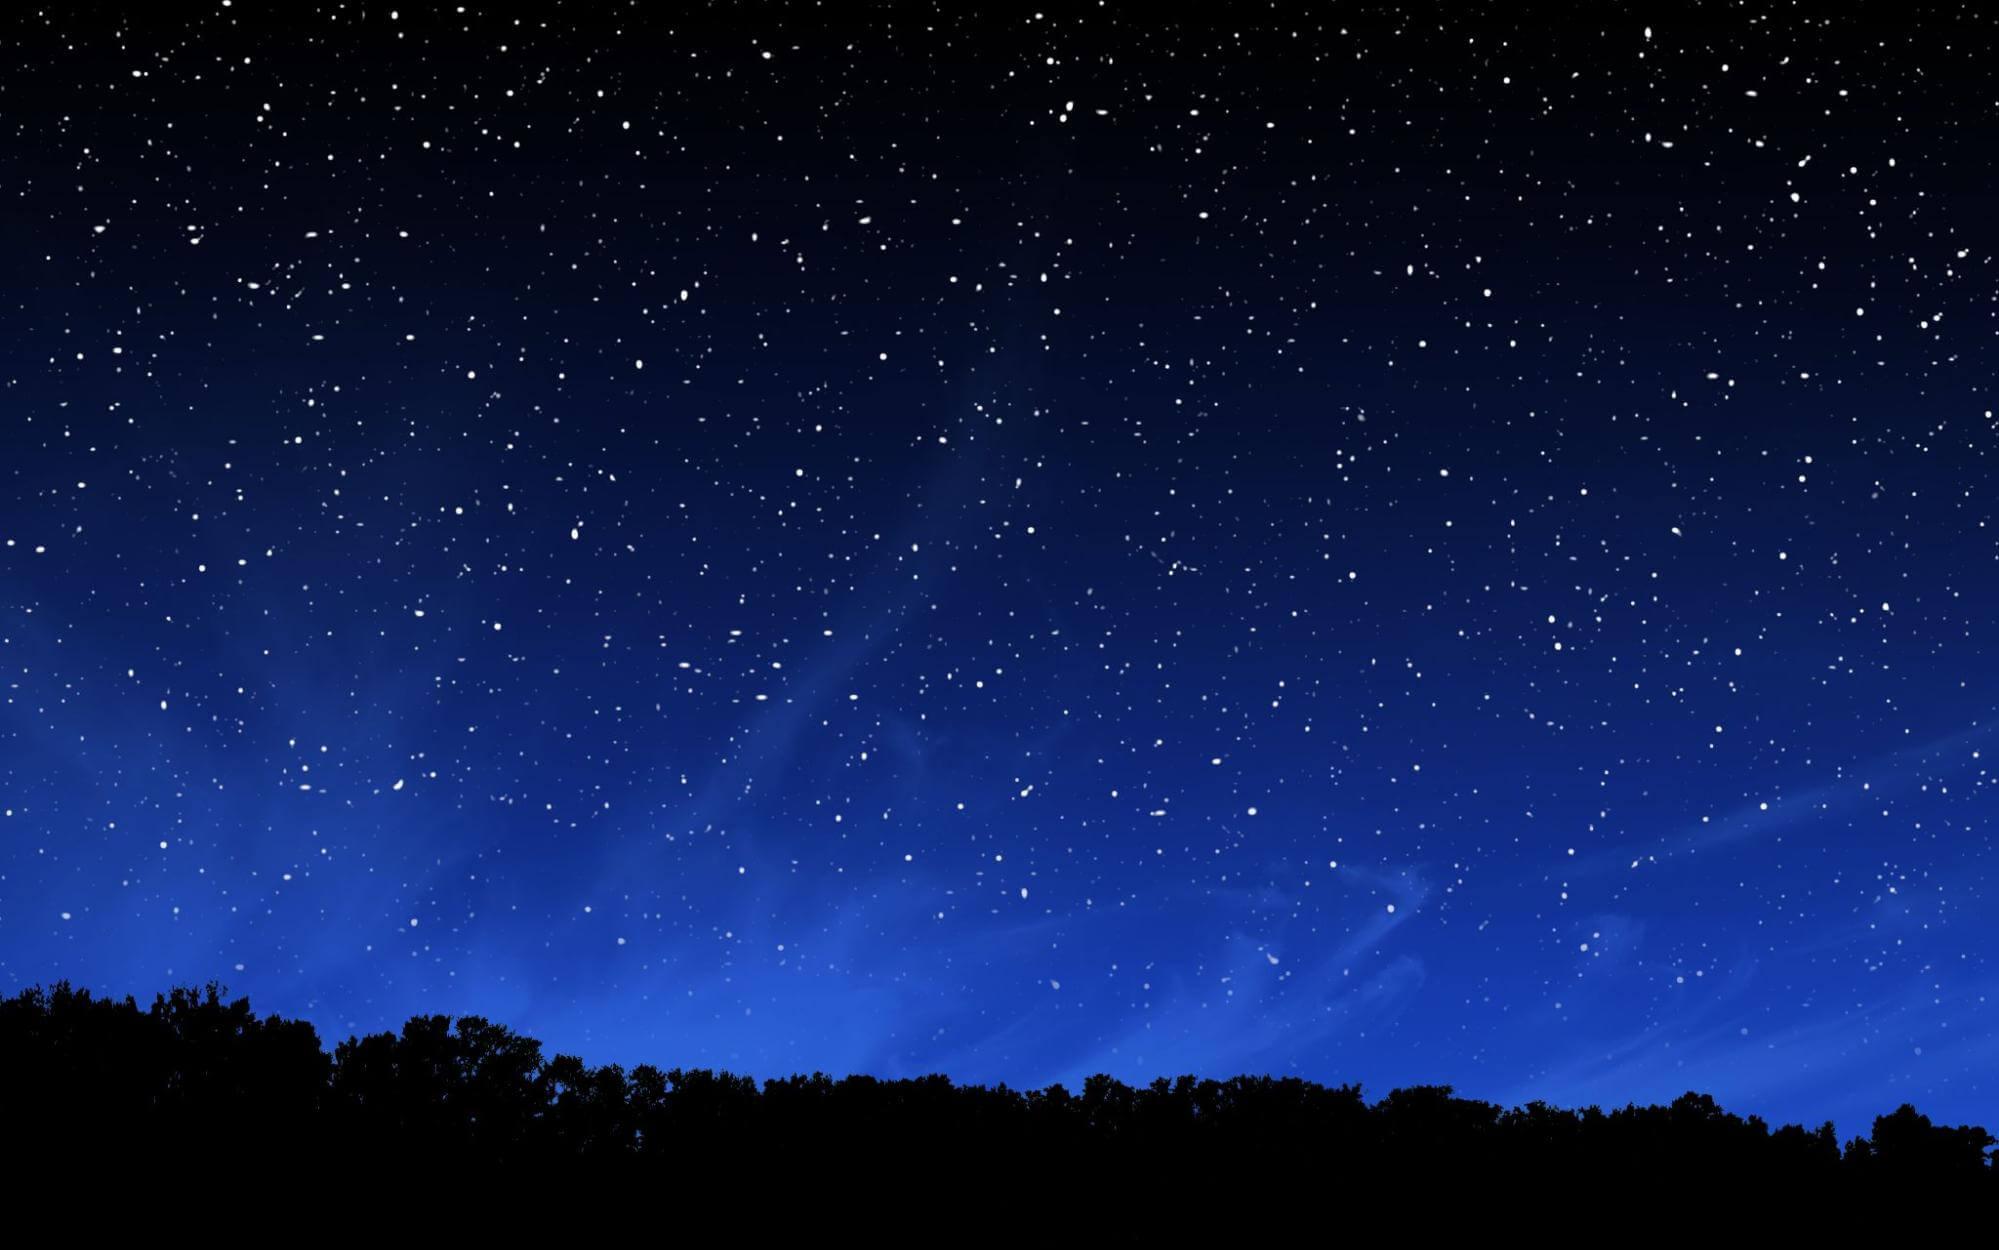 The night sky with stars